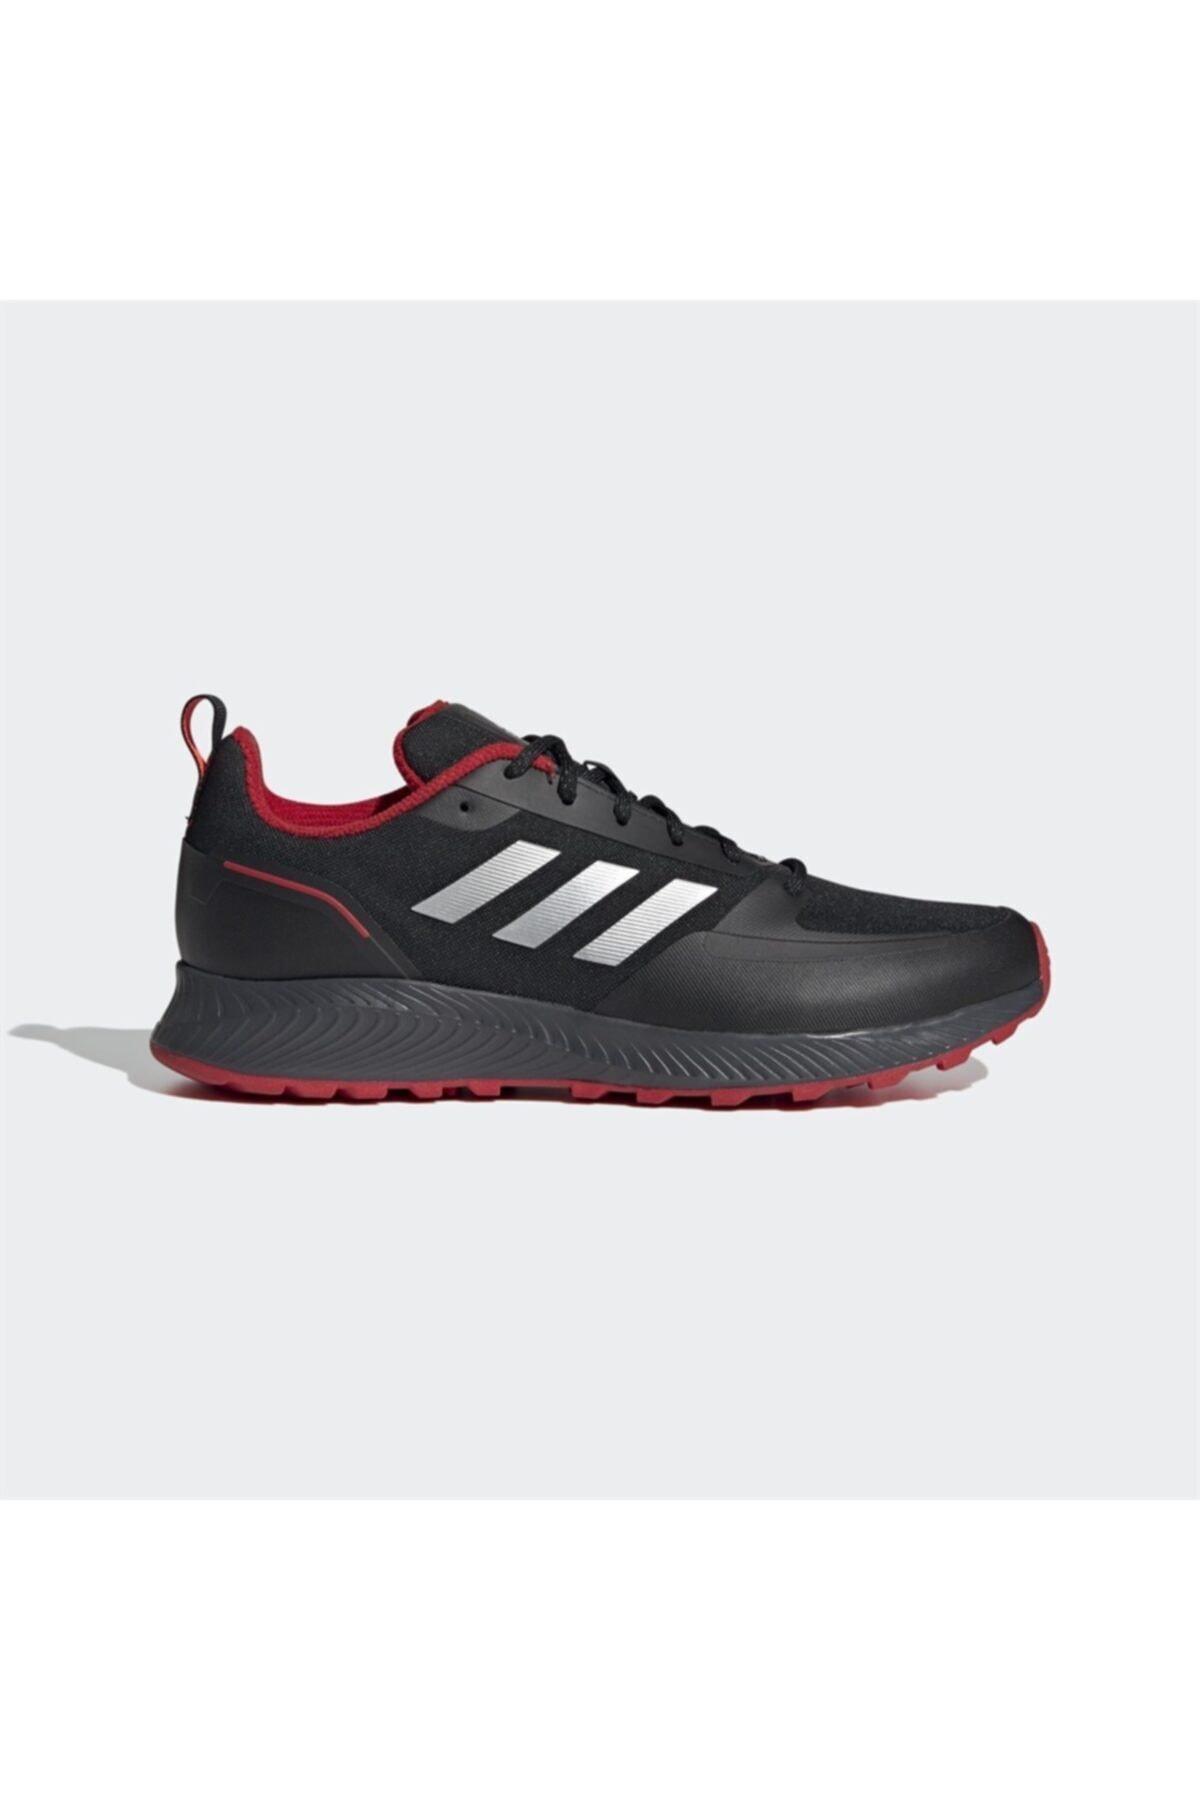 خرید انلاین کفش مخصوص دویدن طرح دار برند ادیداس رنگ مشکی کد ty81187132